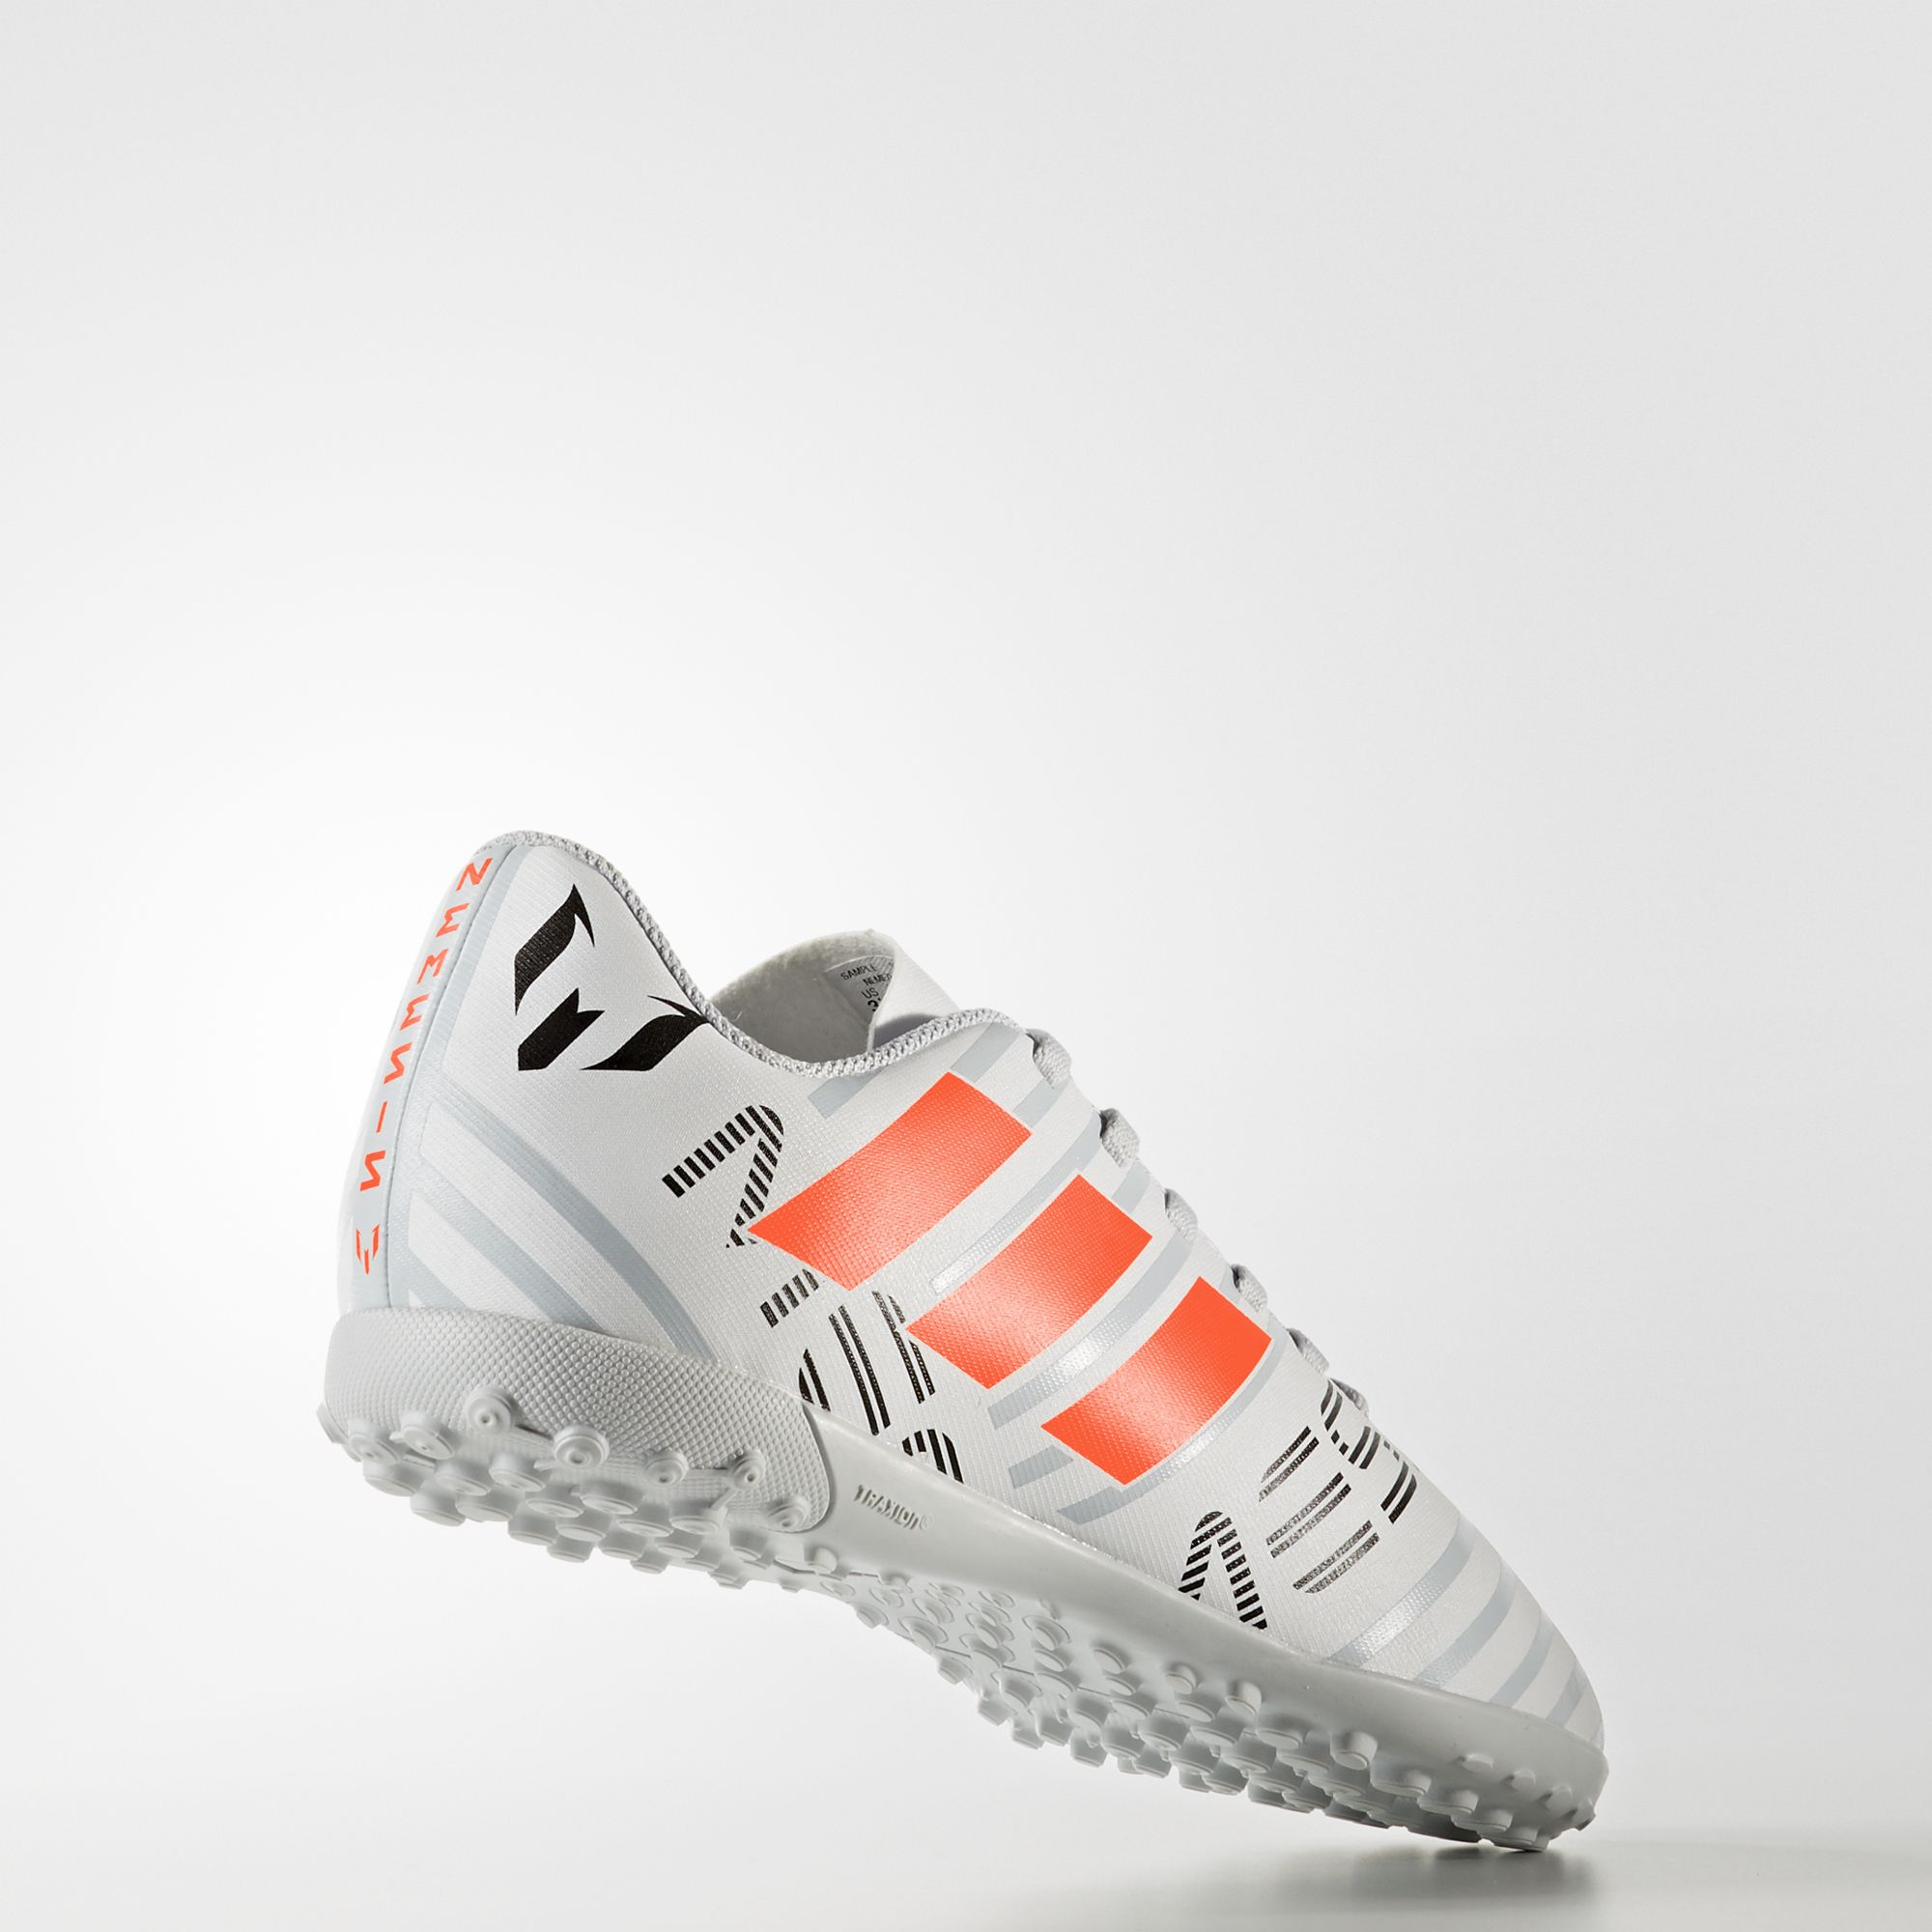 promo code 75346 93a61 Adidas Nemeziz Messi 17.4 TF